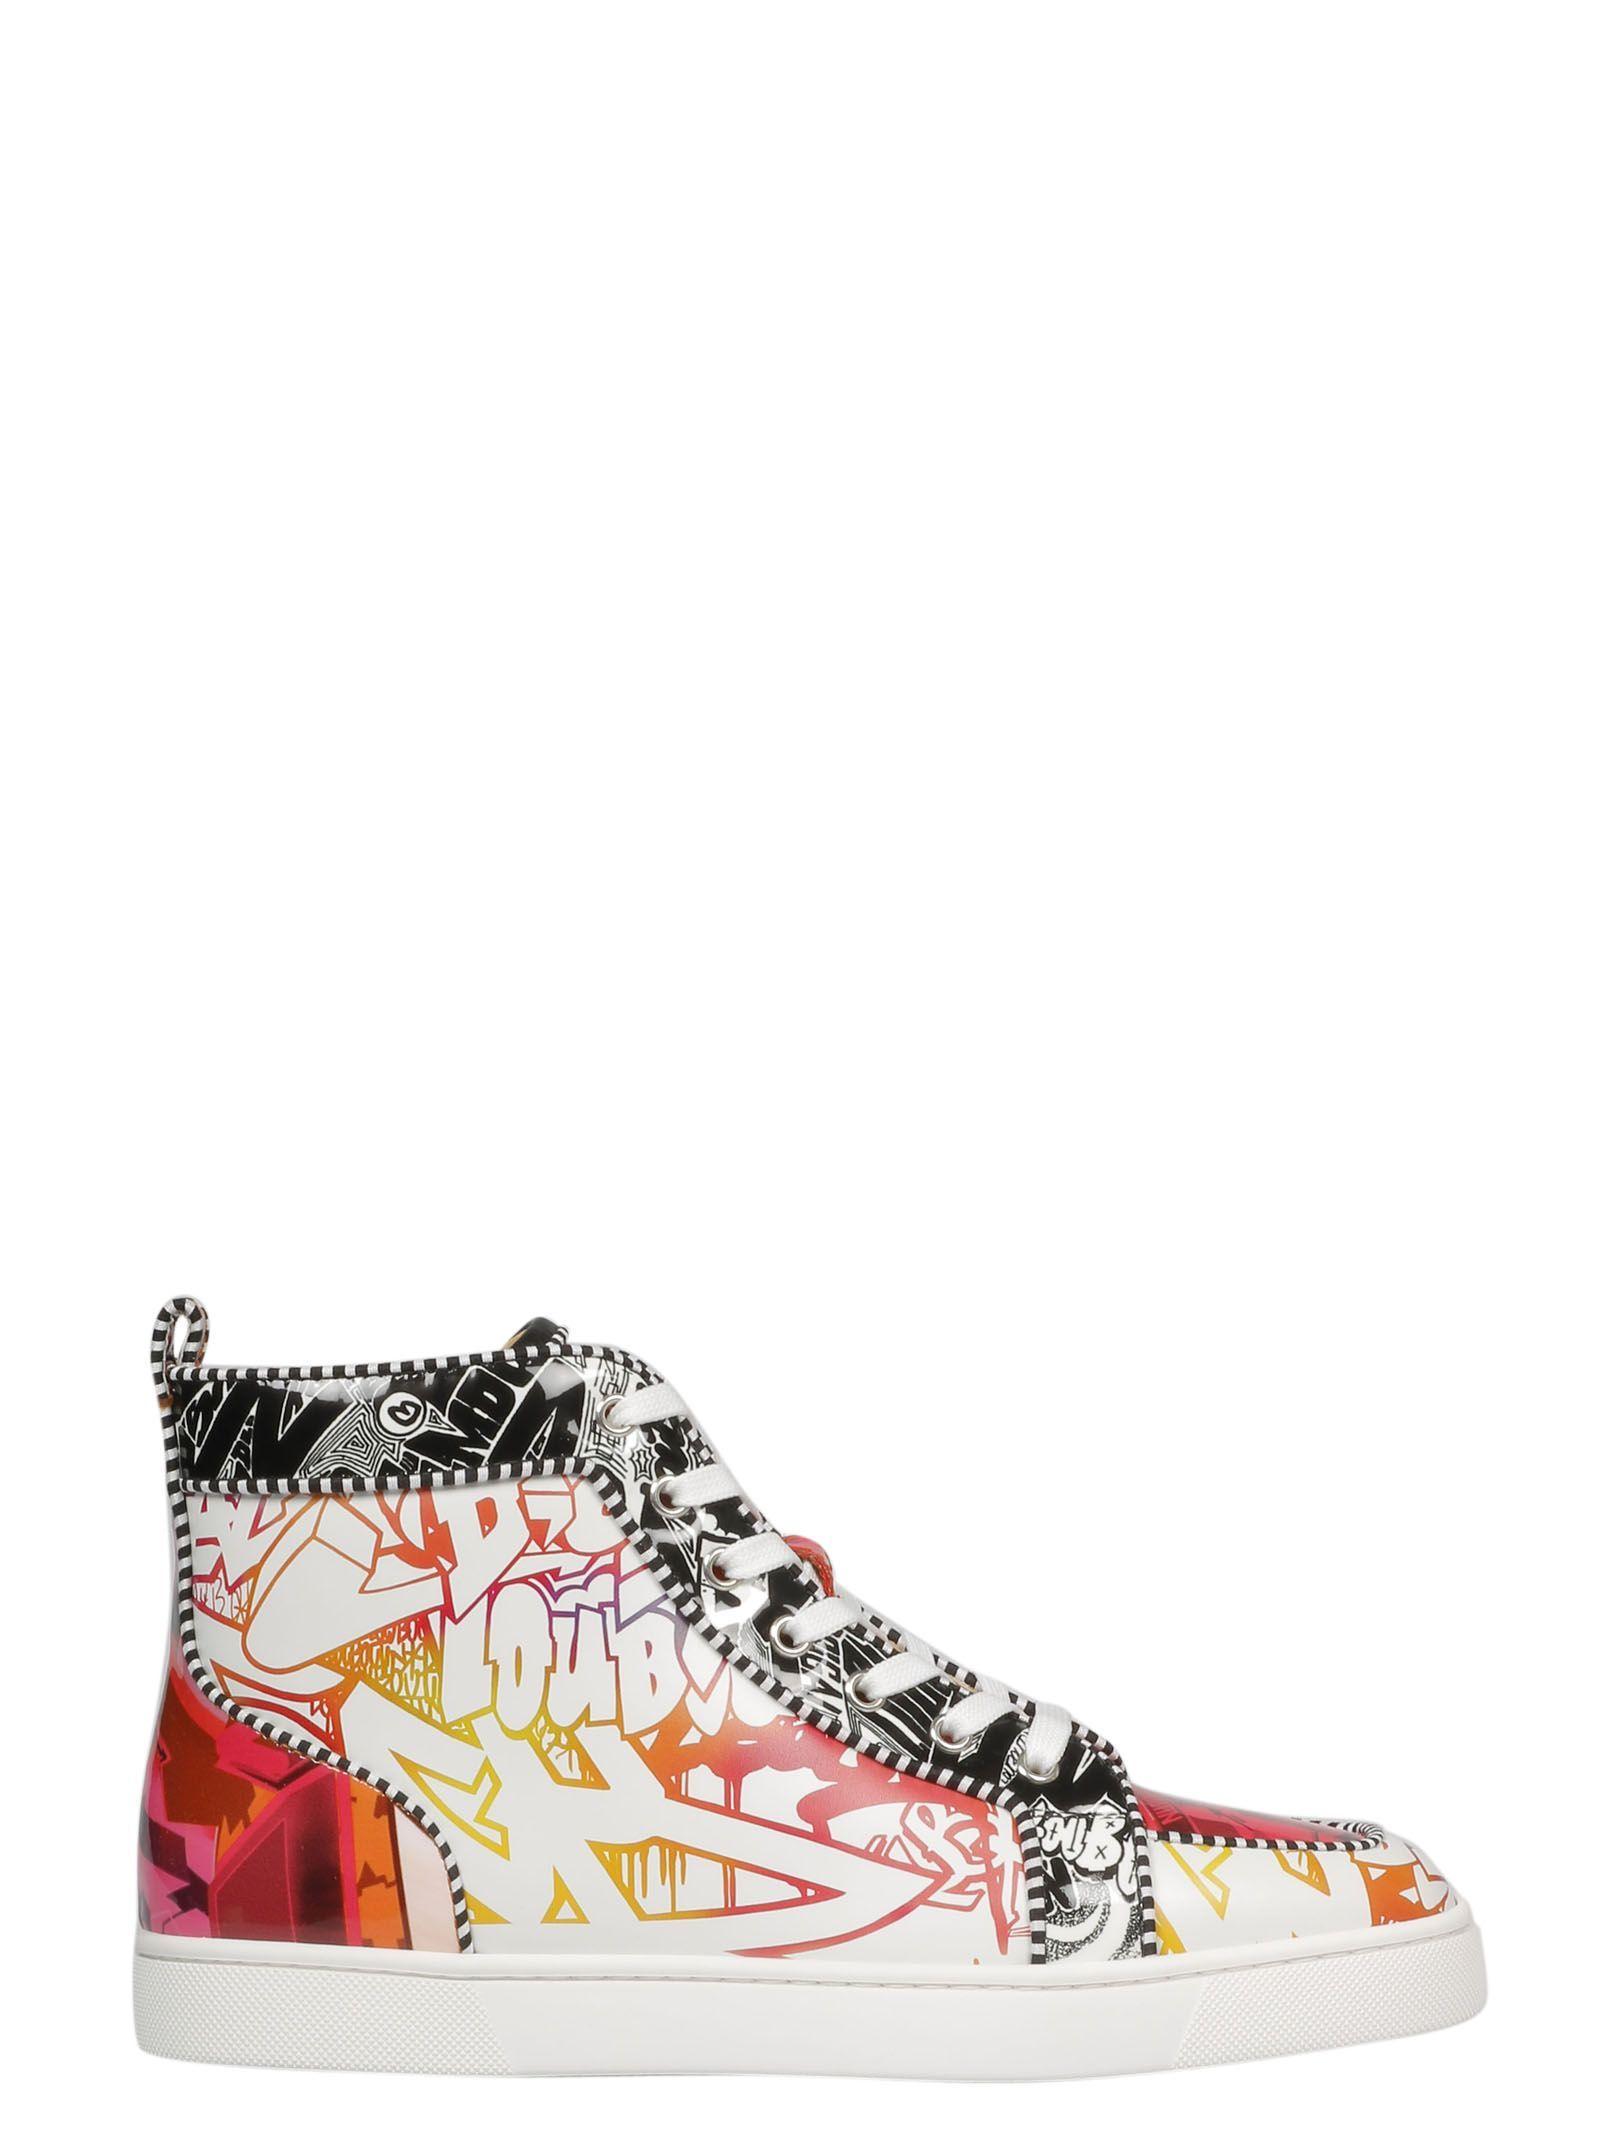 a42d6c58045b CHRISTIAN LOUBOUTIN PRINTED HI-TOP SNEAKERS.  christianlouboutin  shoes